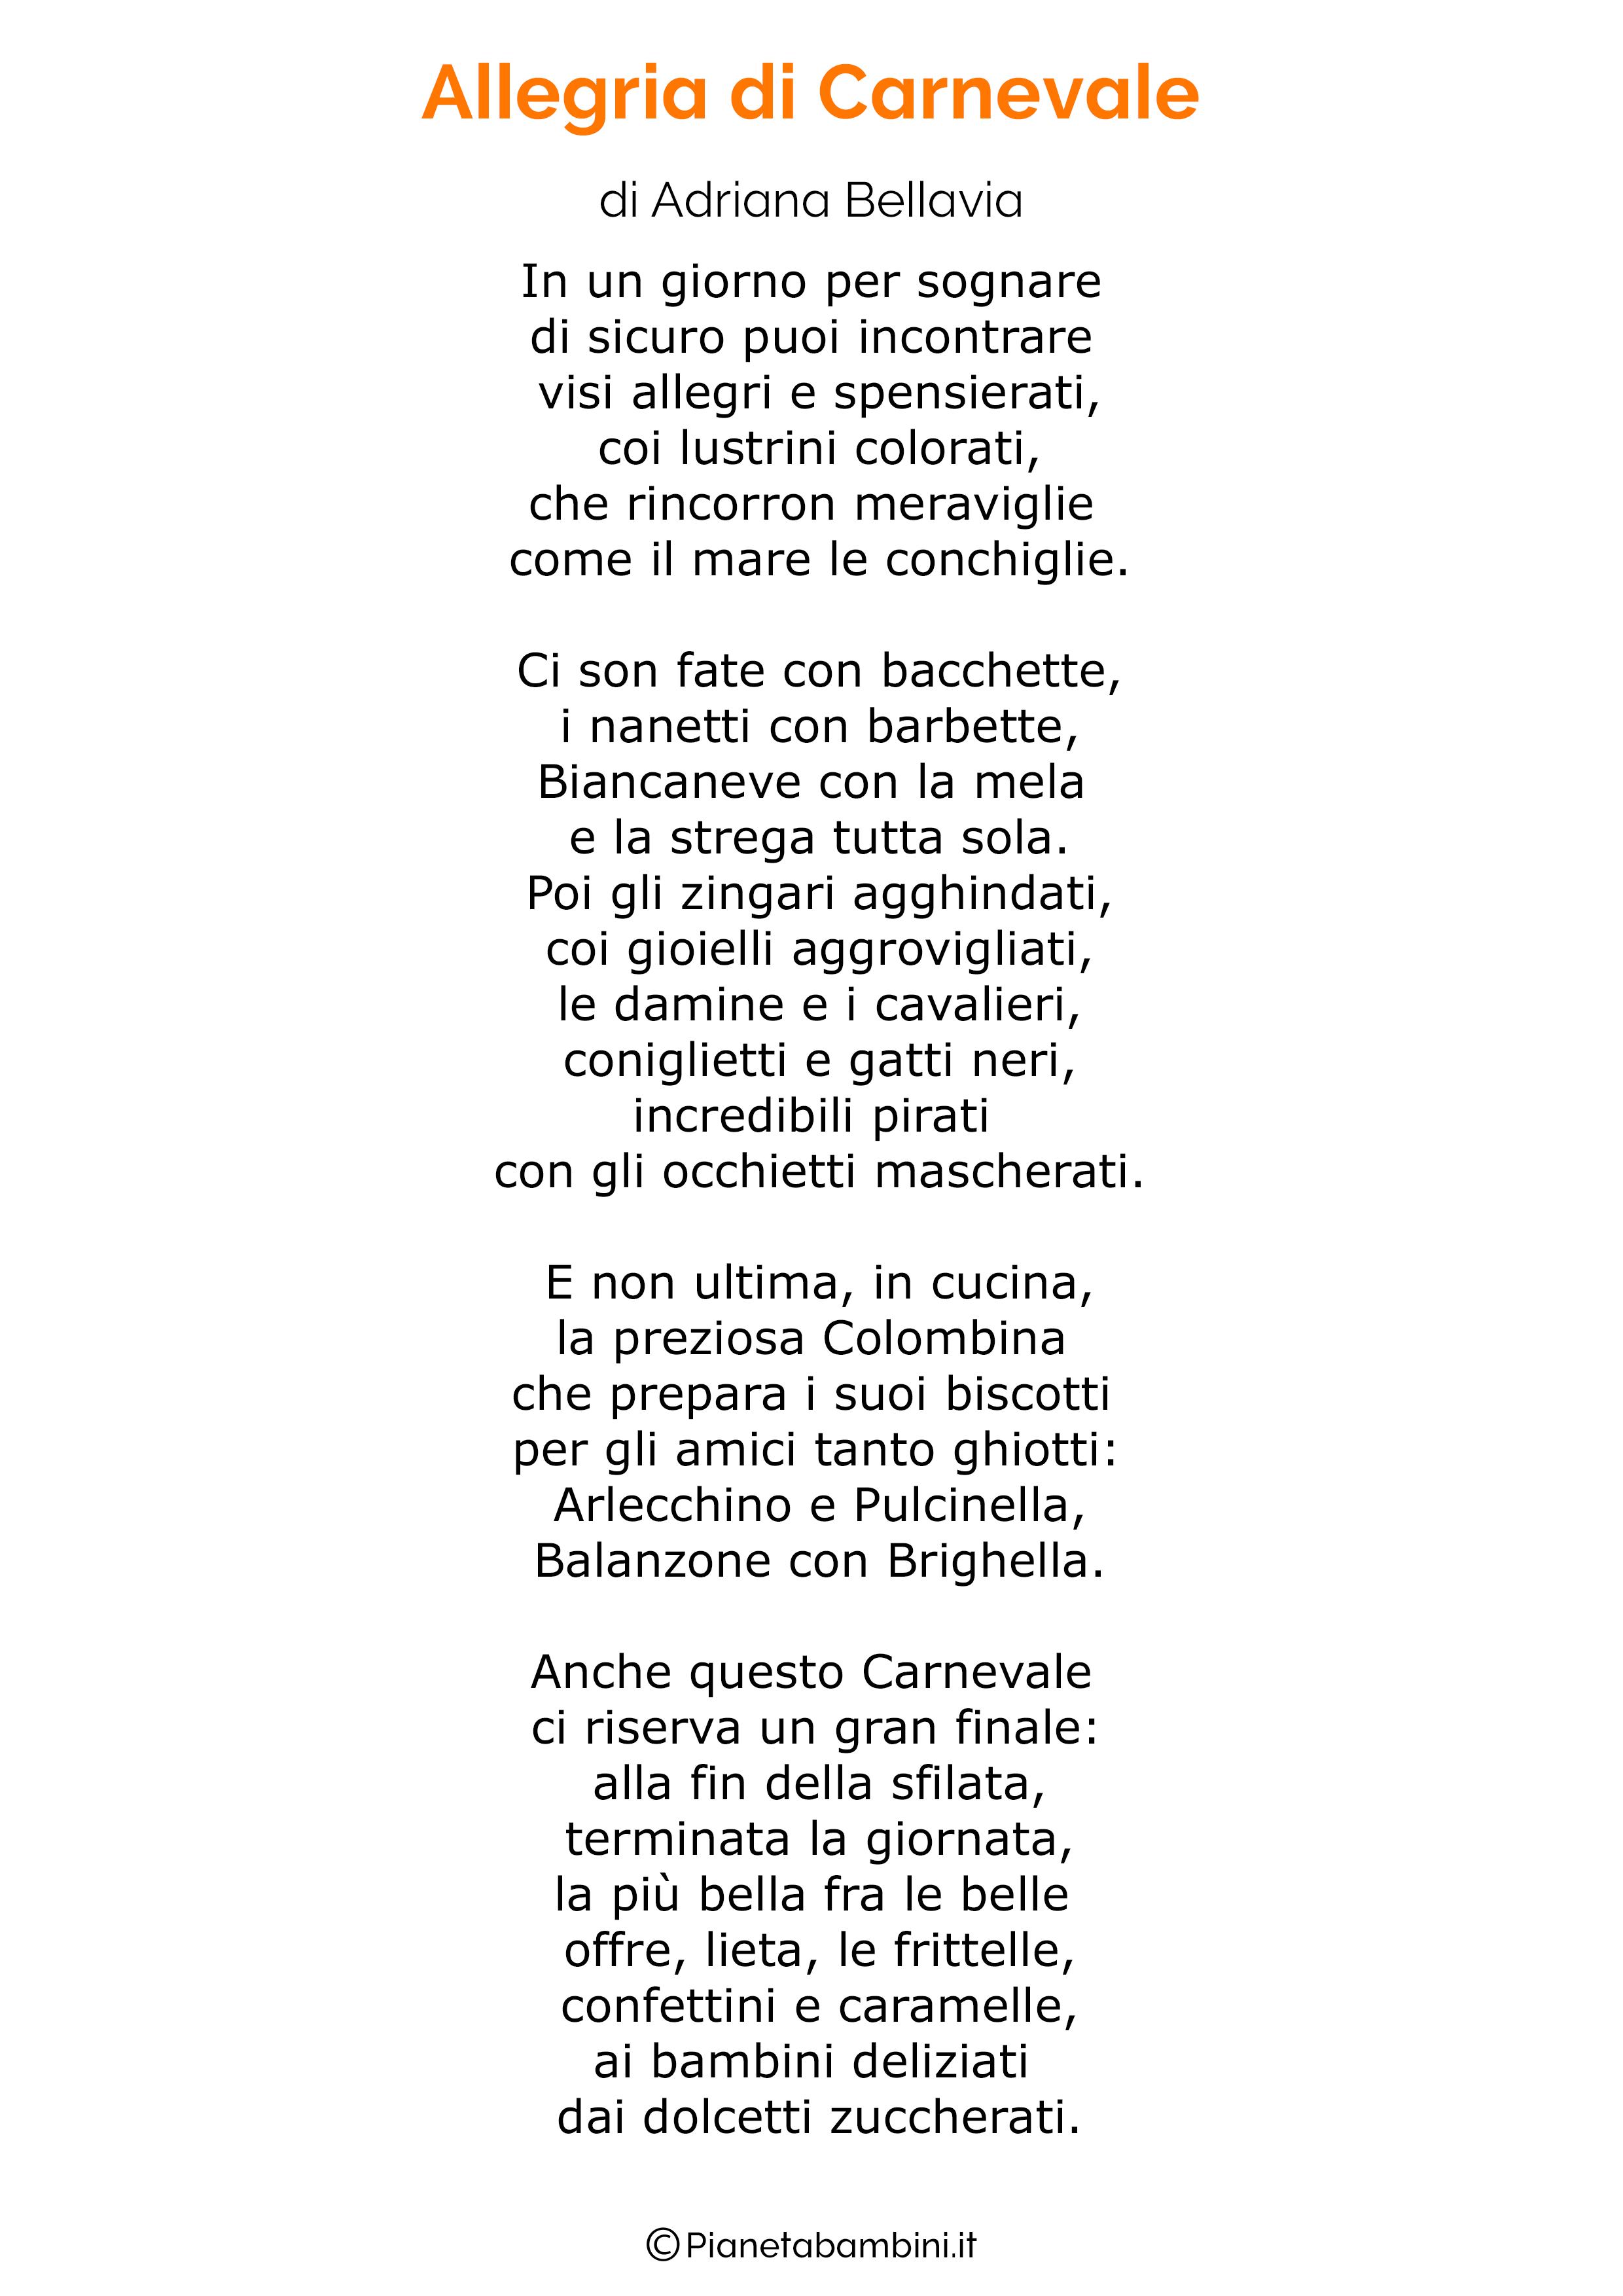 Poesie di Carnevale per bambini 20